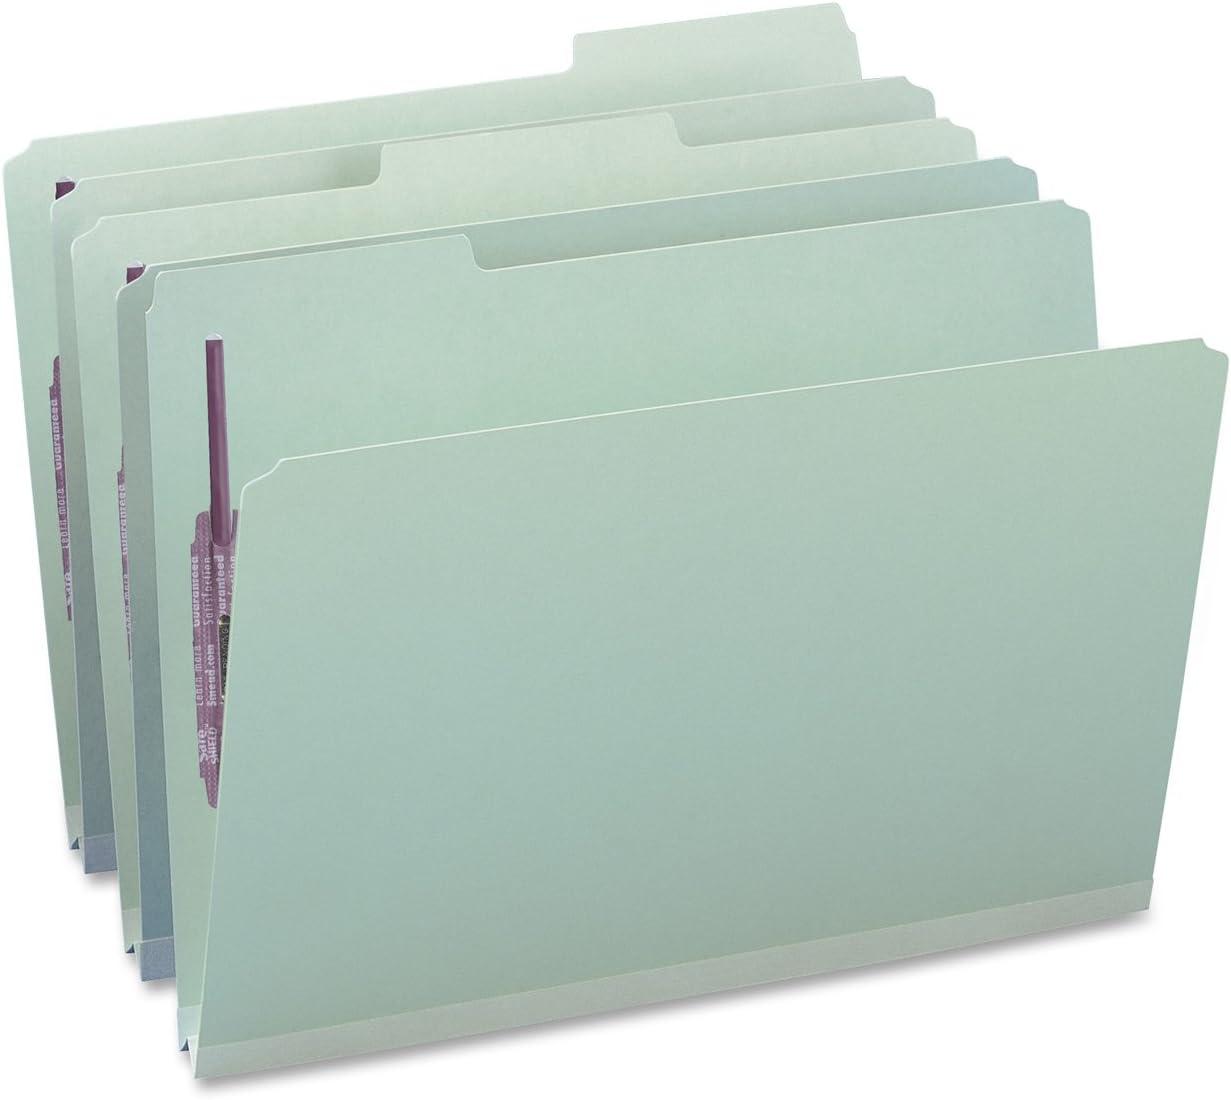 Smead 19944 Three Inch Expansion Fastener Folder 1//3 Top Tab Legal Gray Green 25//Box